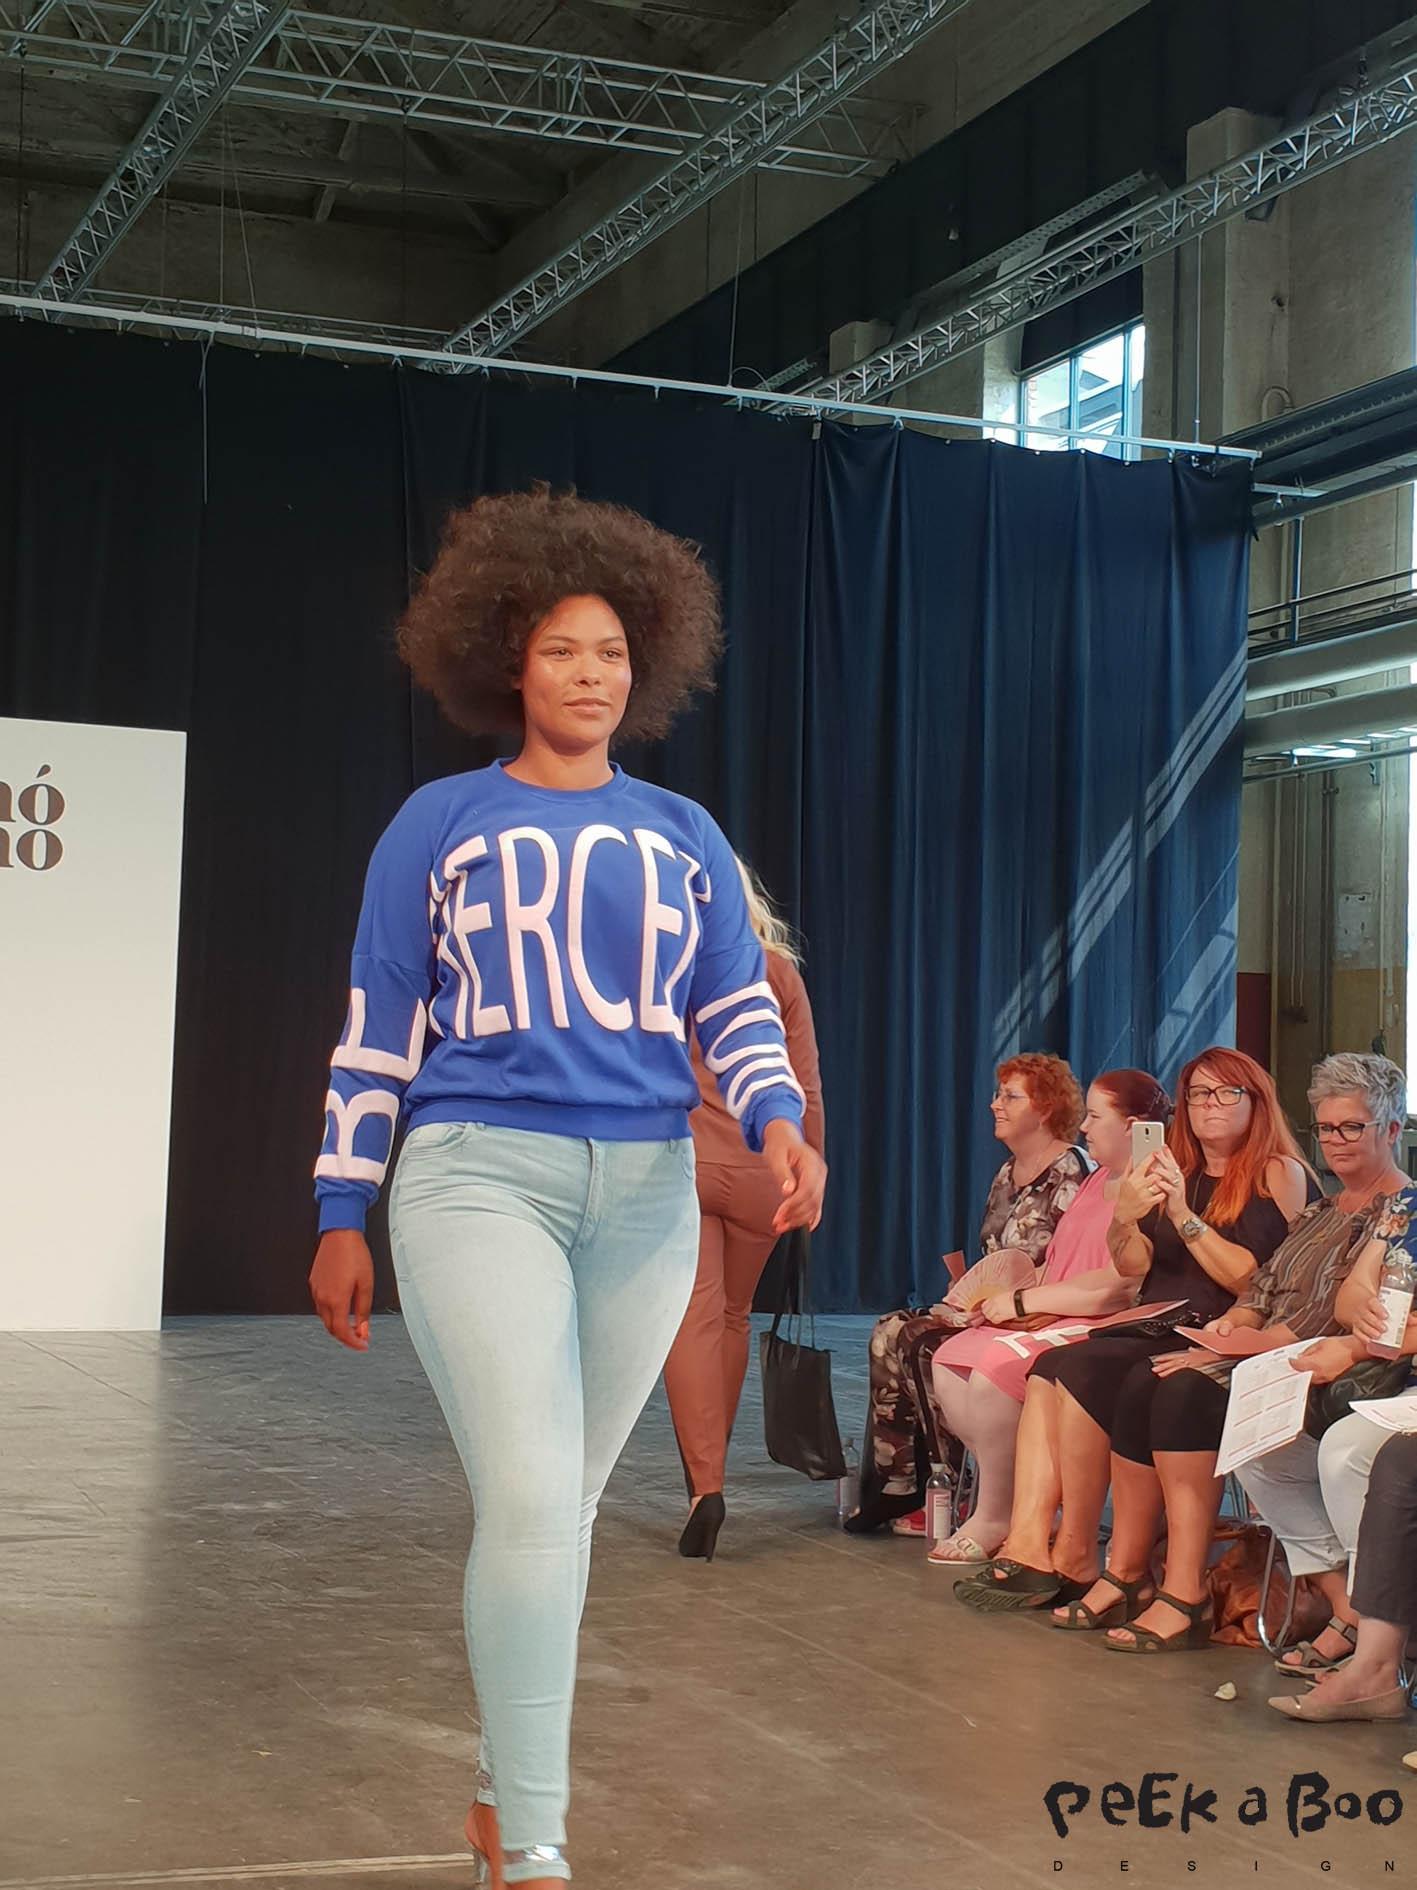 Annoanno plussize fashionshow at the Copenhagen fashion week.